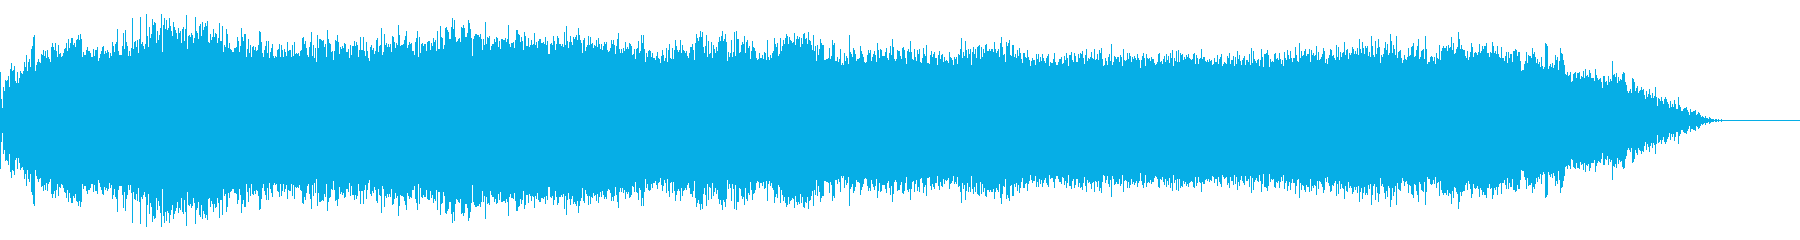 Drill アニメ風ドリル音 歯医者 4の再生済みの波形